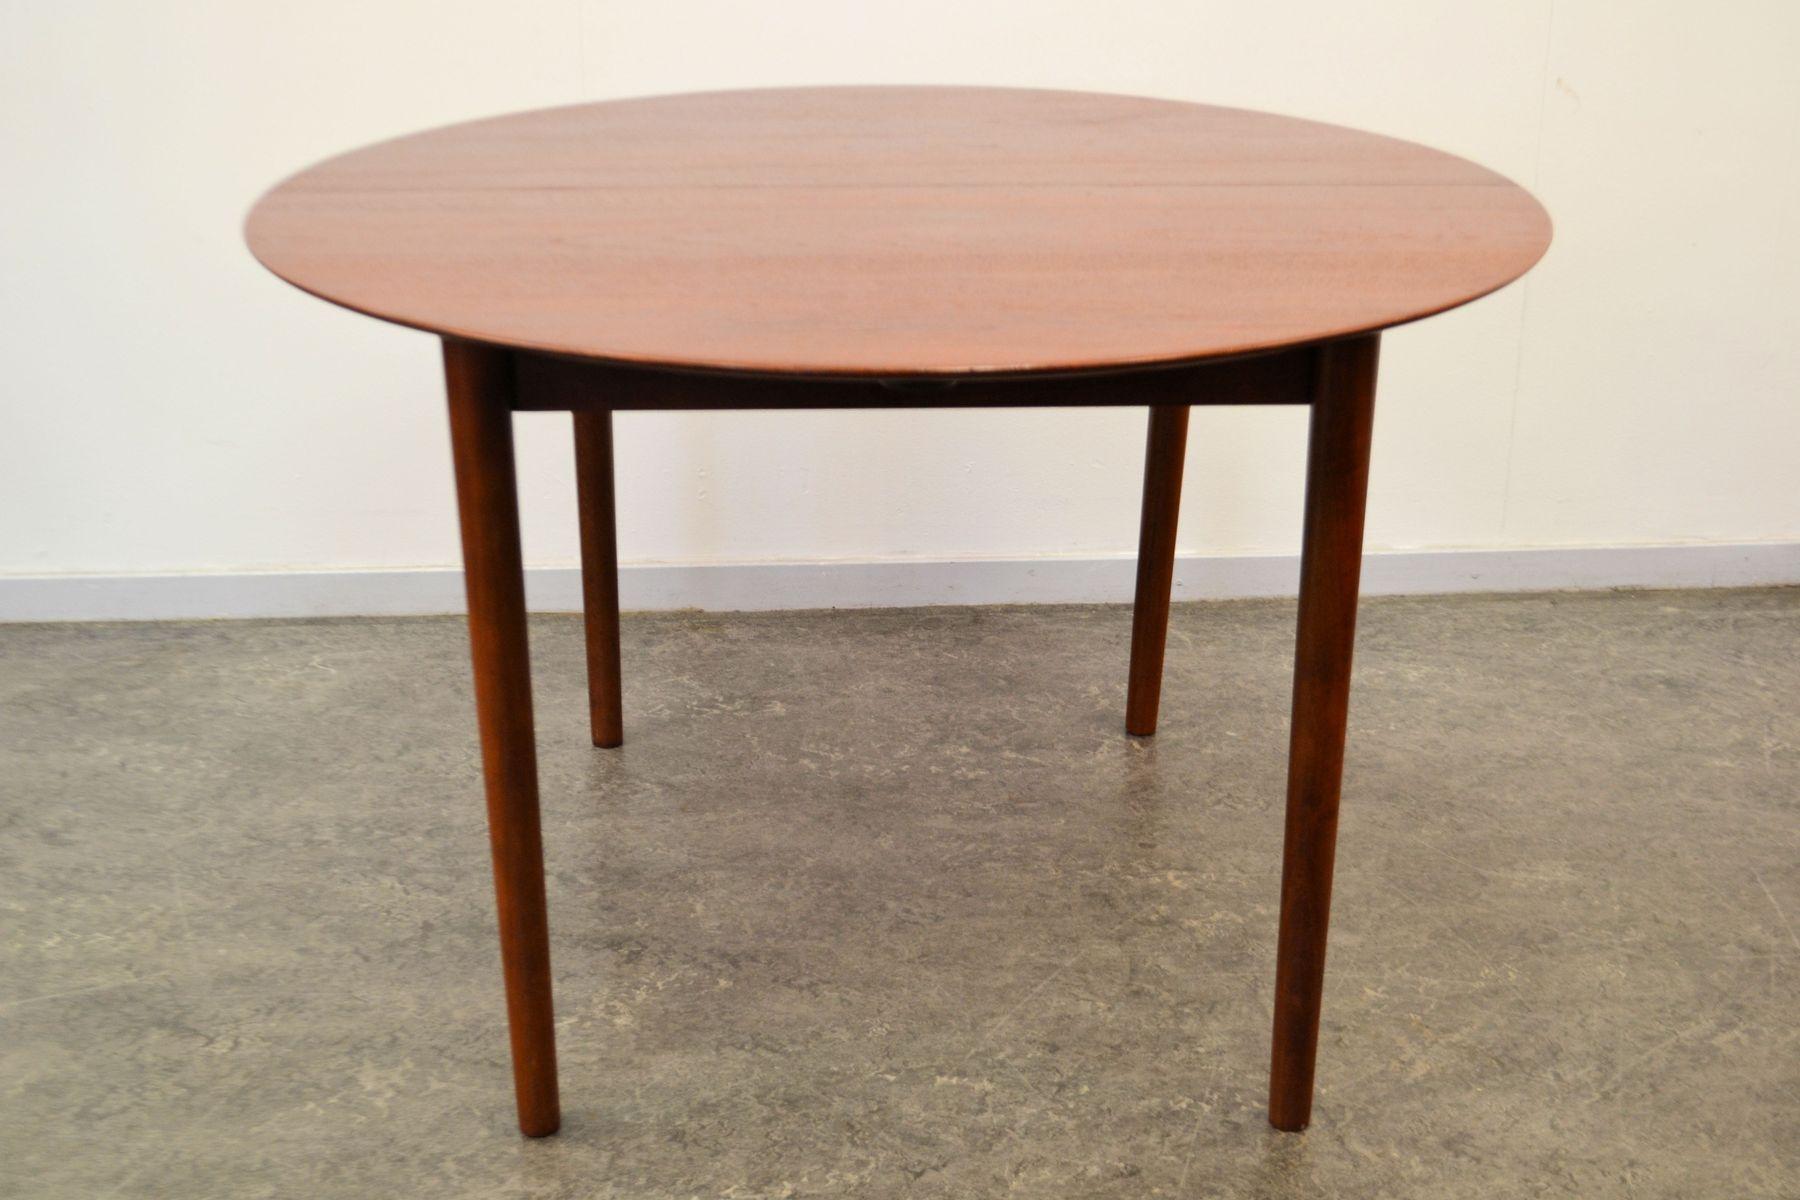 Table de salle manger par hvidt molgaard nielsen pour for Salle a manger 1950